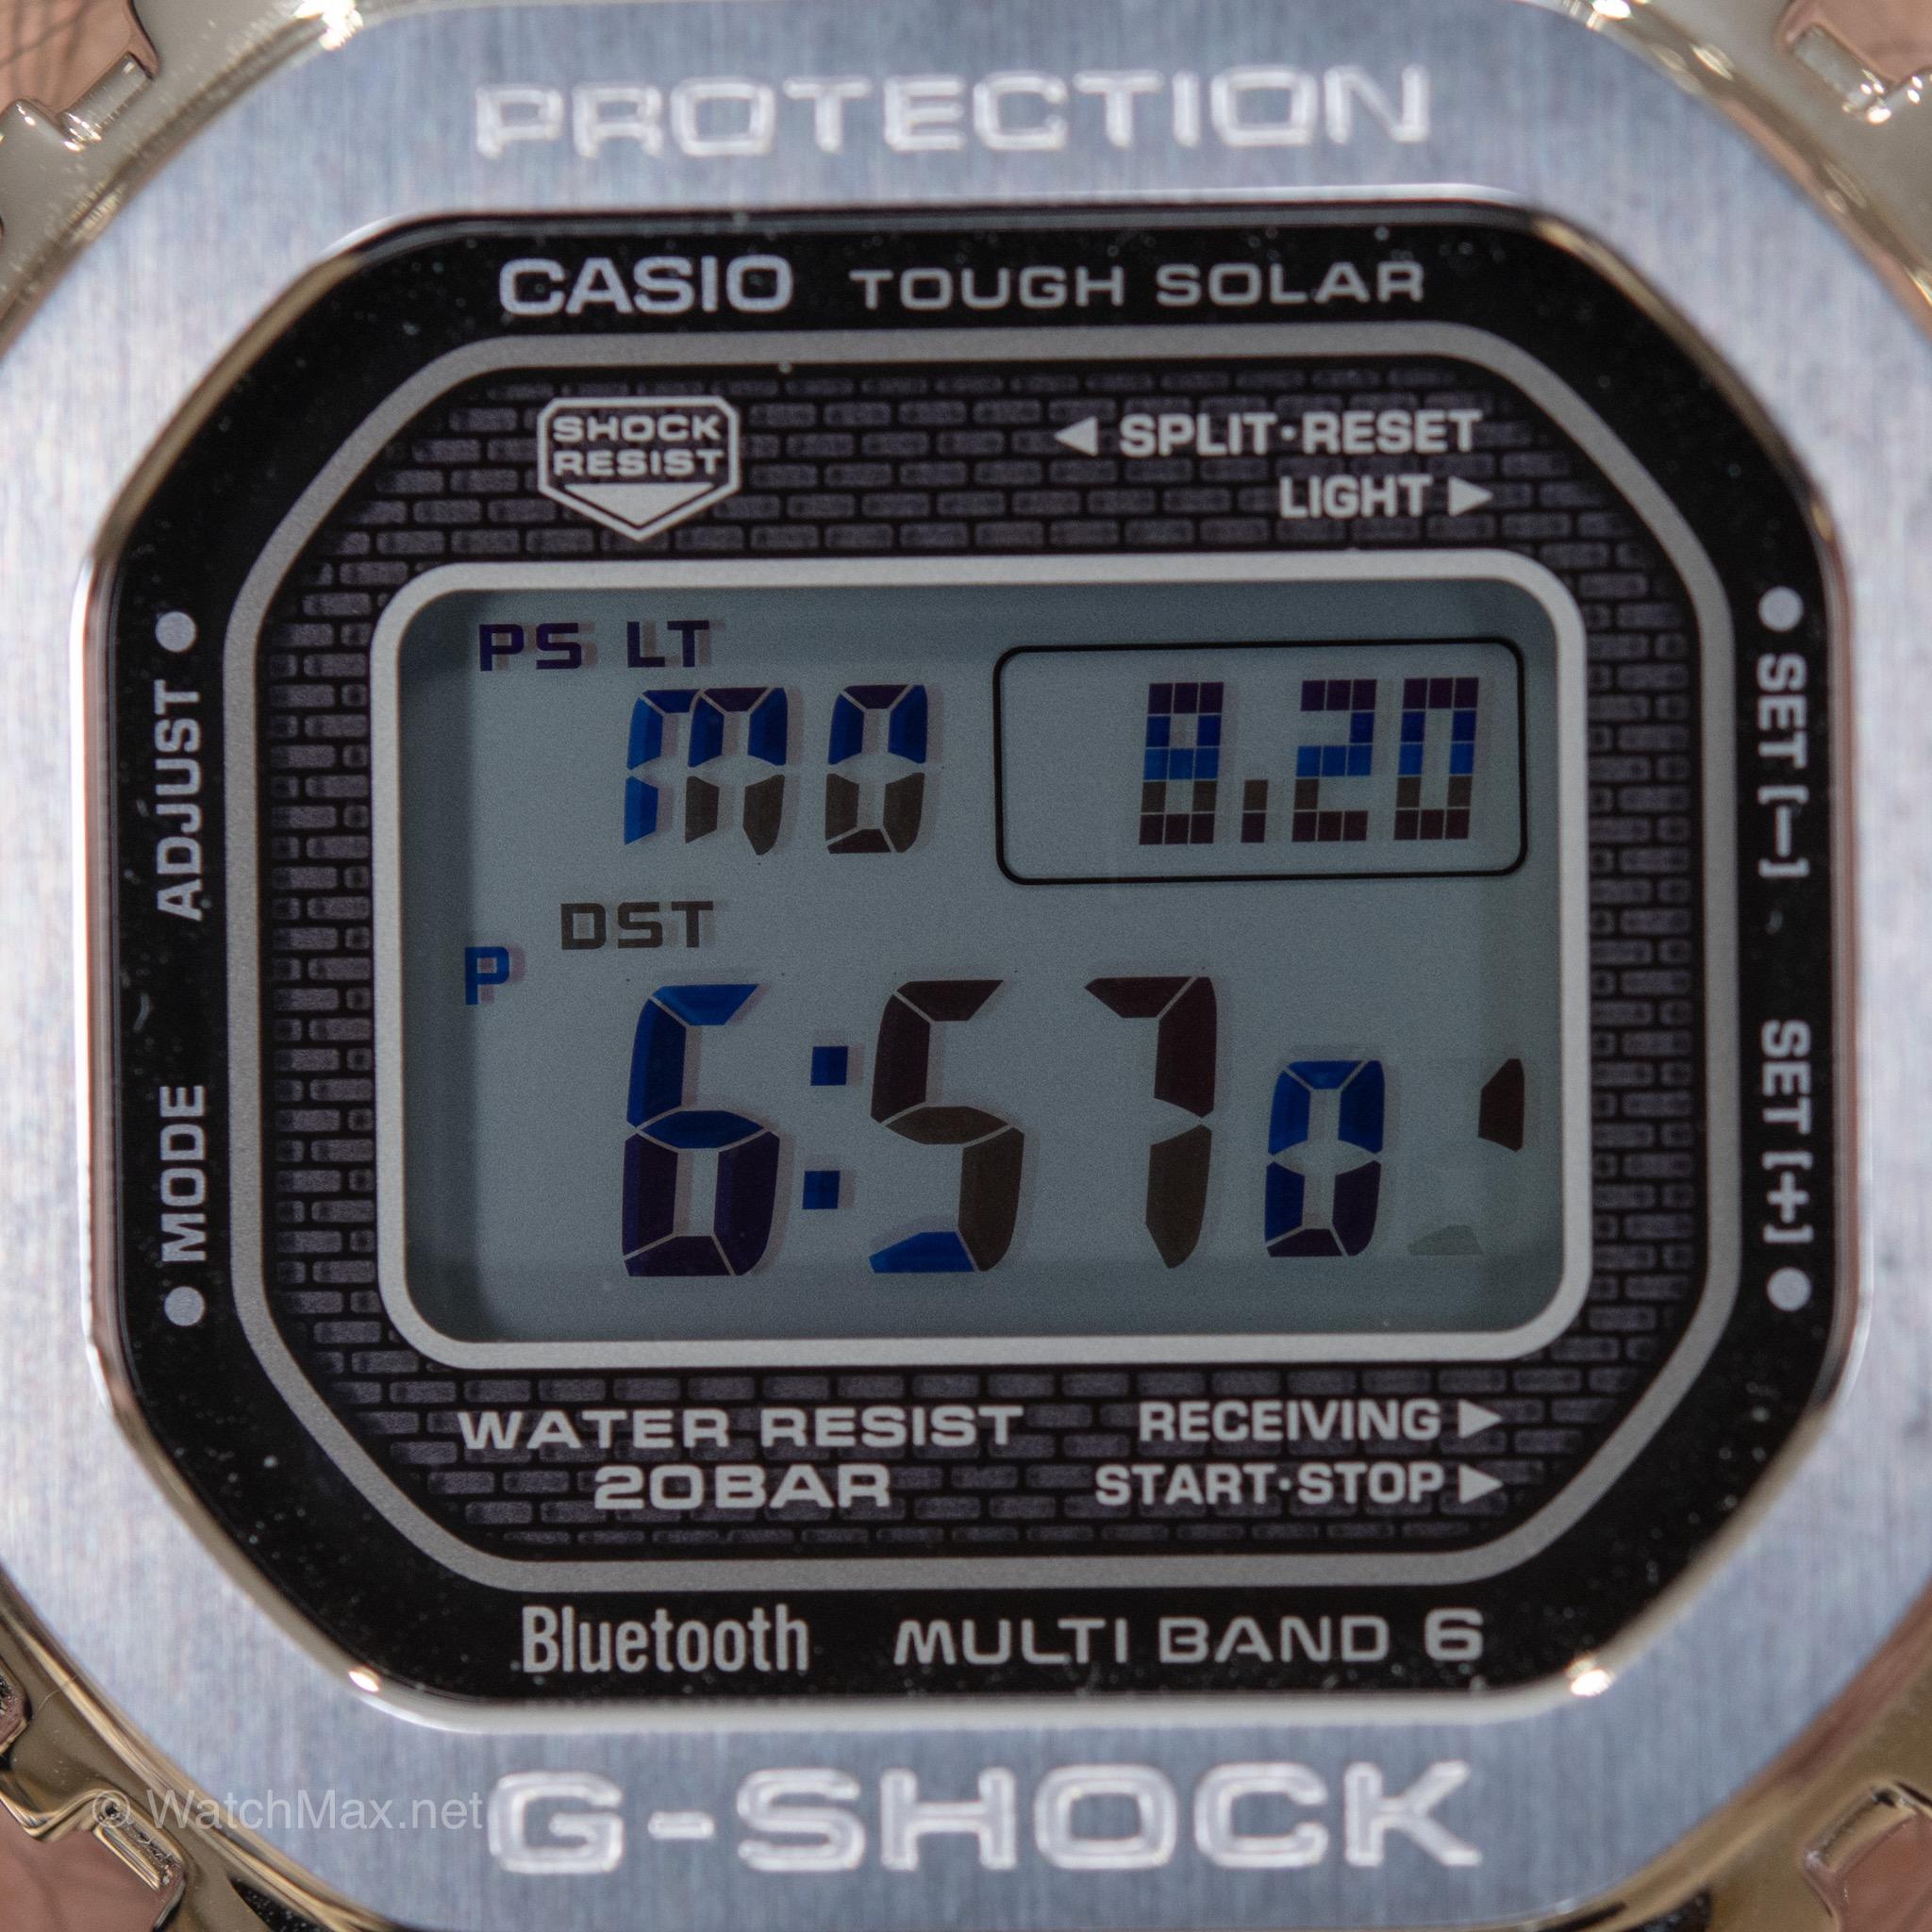 casio g-shock 35th anniversary models - 10.JPG